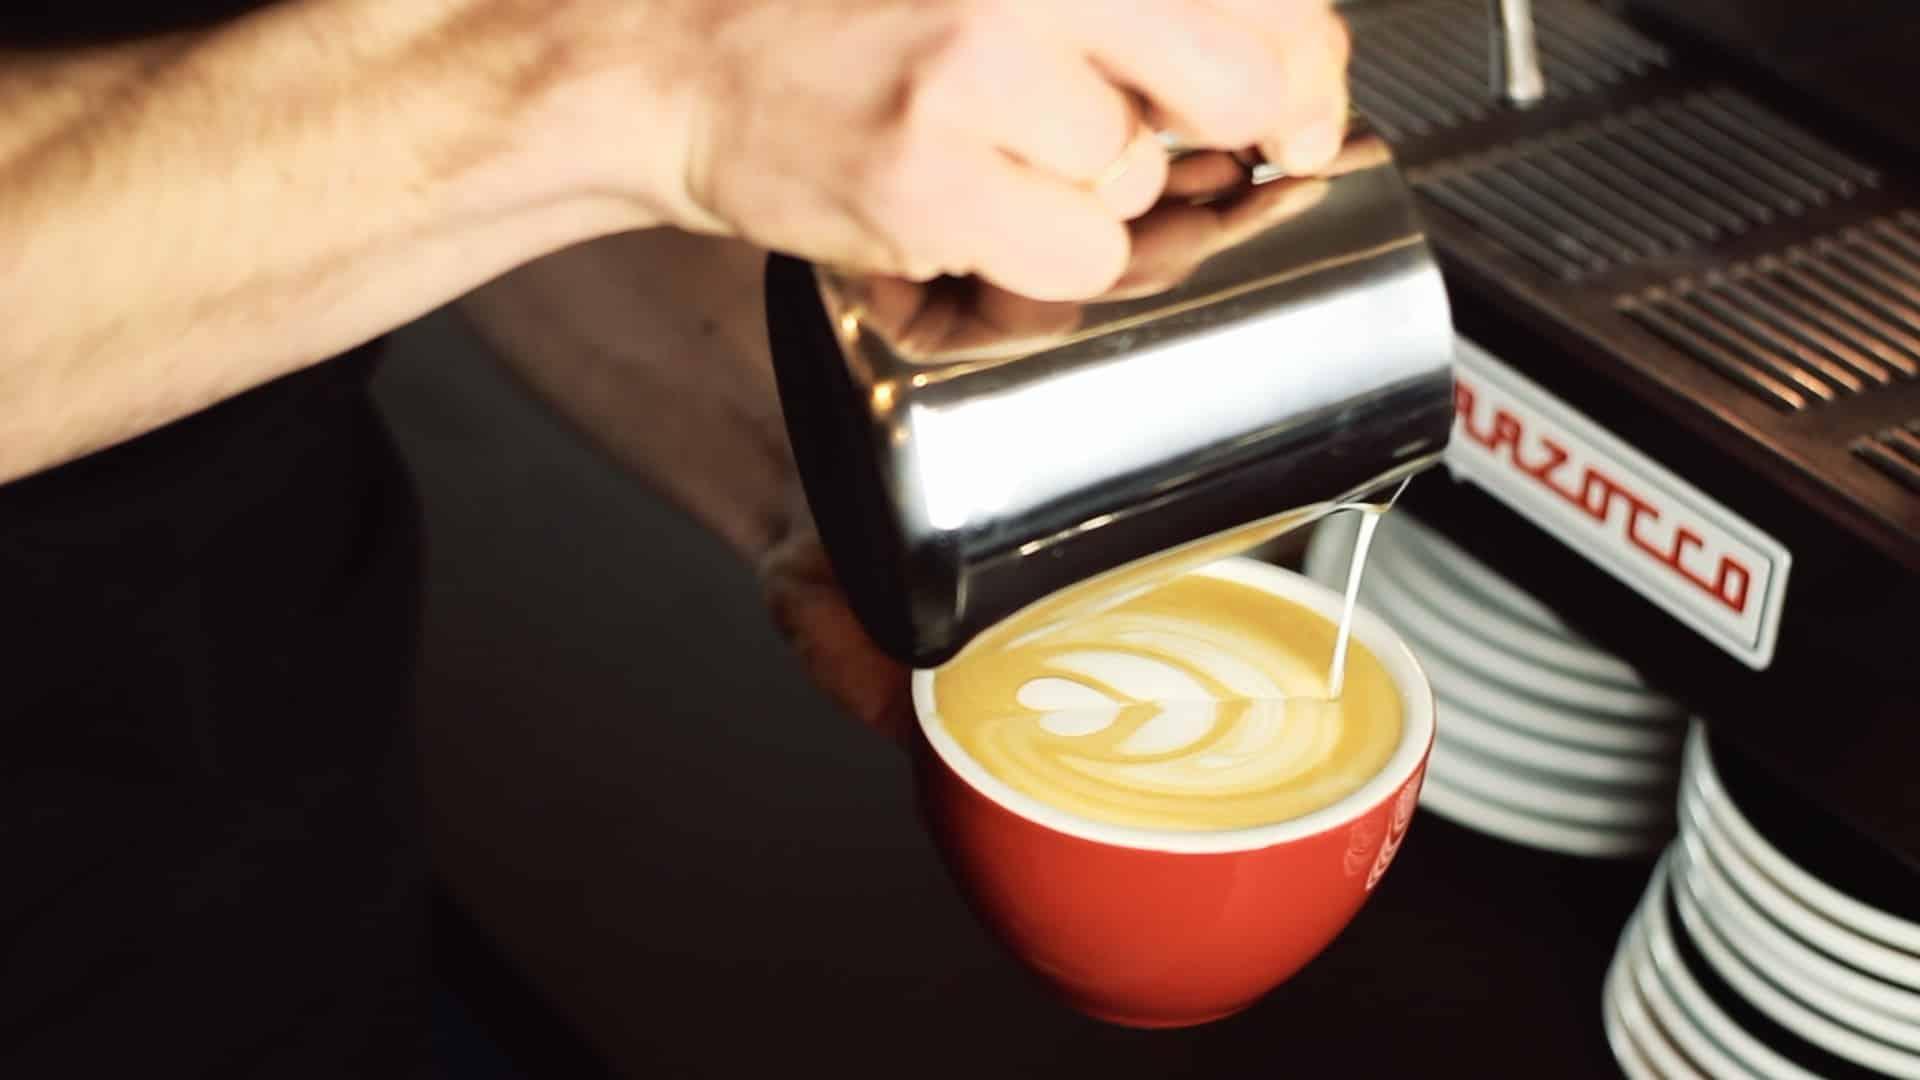 Latte art - wzory krok po kroku: tulipan